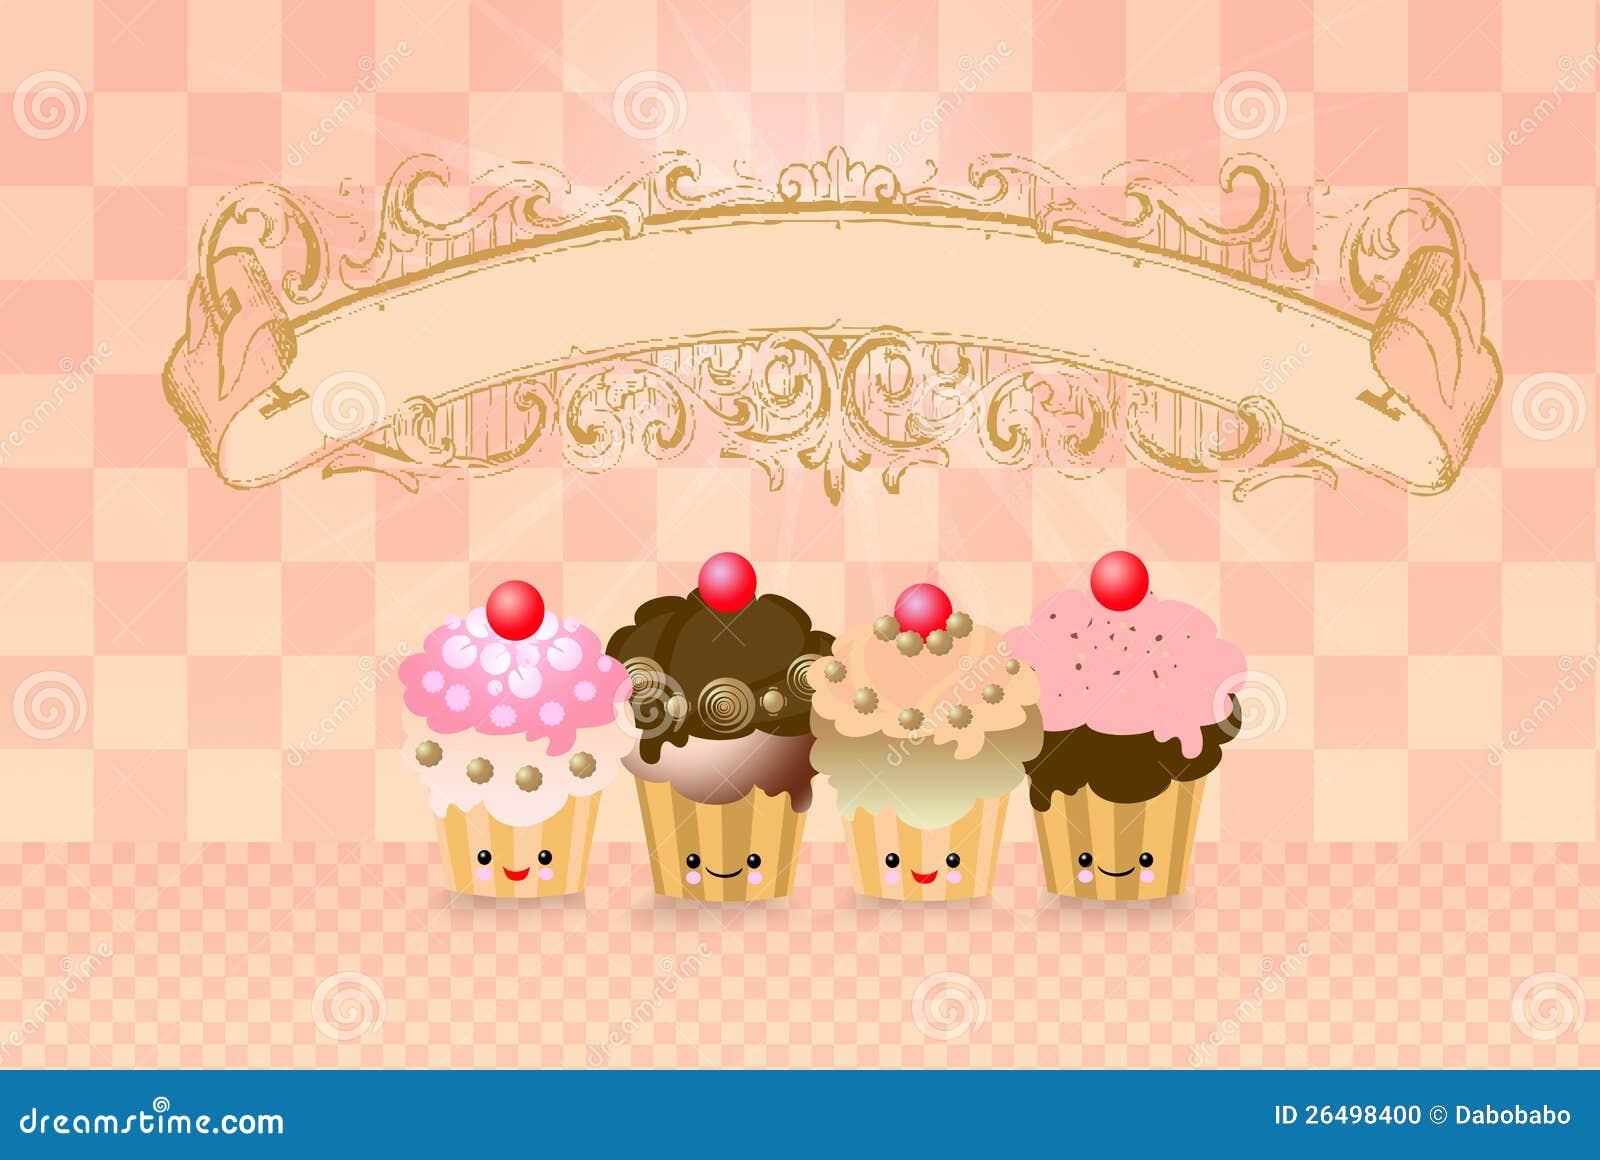 Wallpaper Cake Design